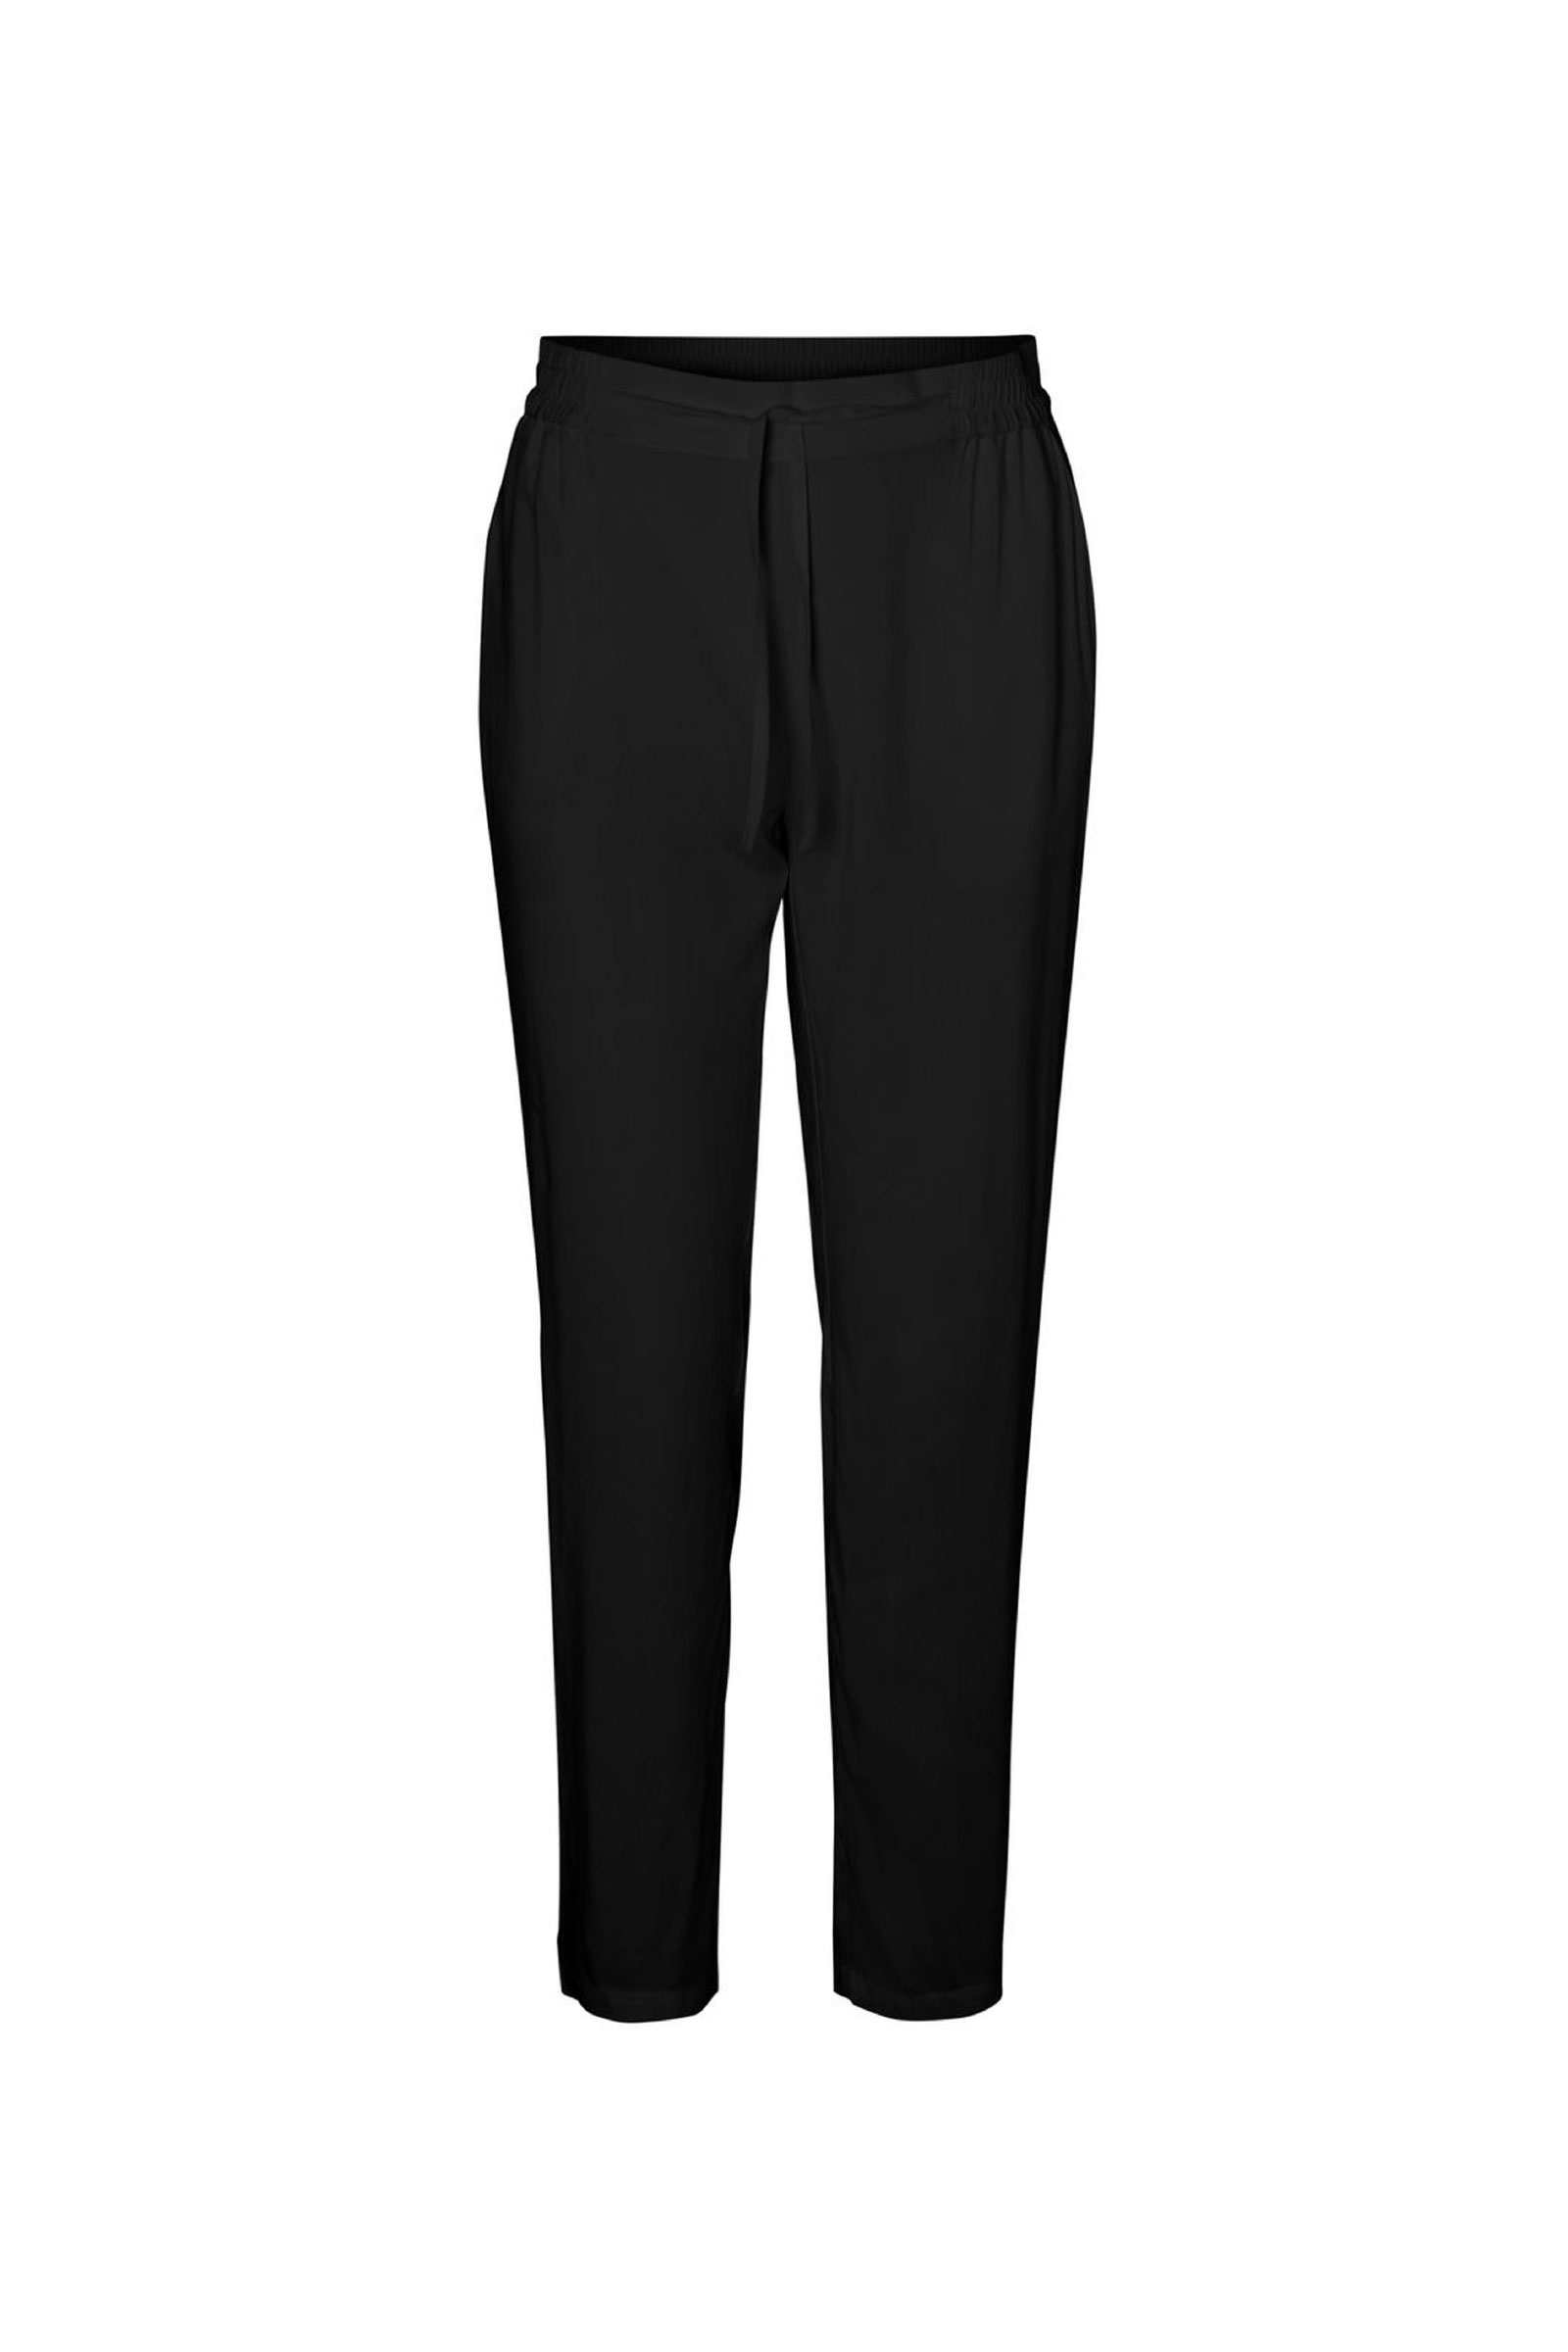 VERO MODA PANTALONE Donna Modello SIMPLY VERO MODA | Pantalone | 10245160Black